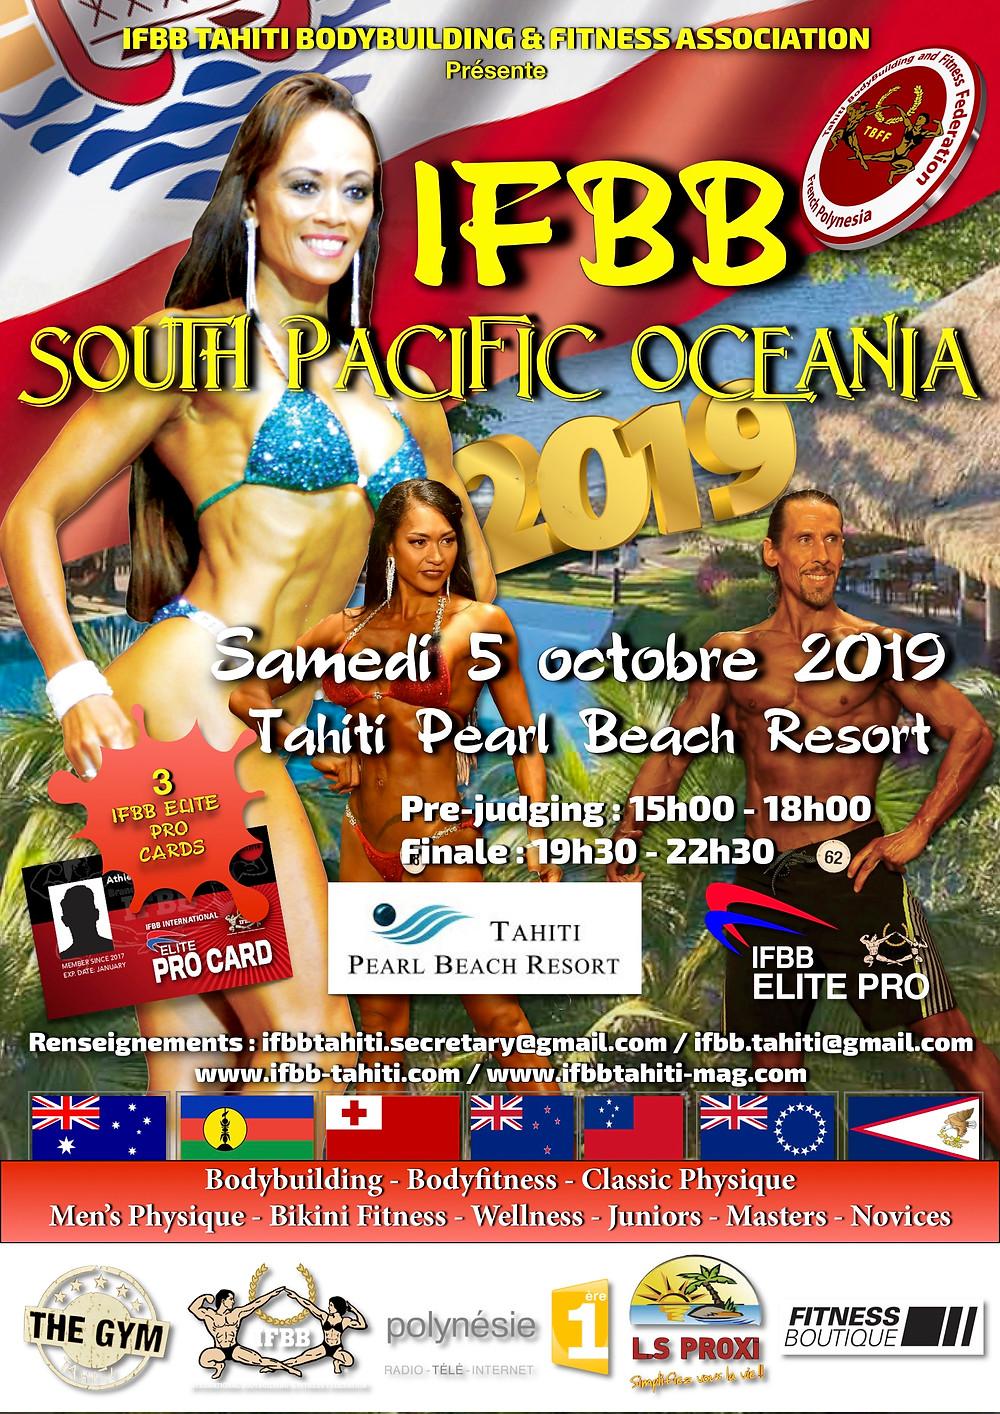 IFBB Tahiti Magazine-Fitness Network